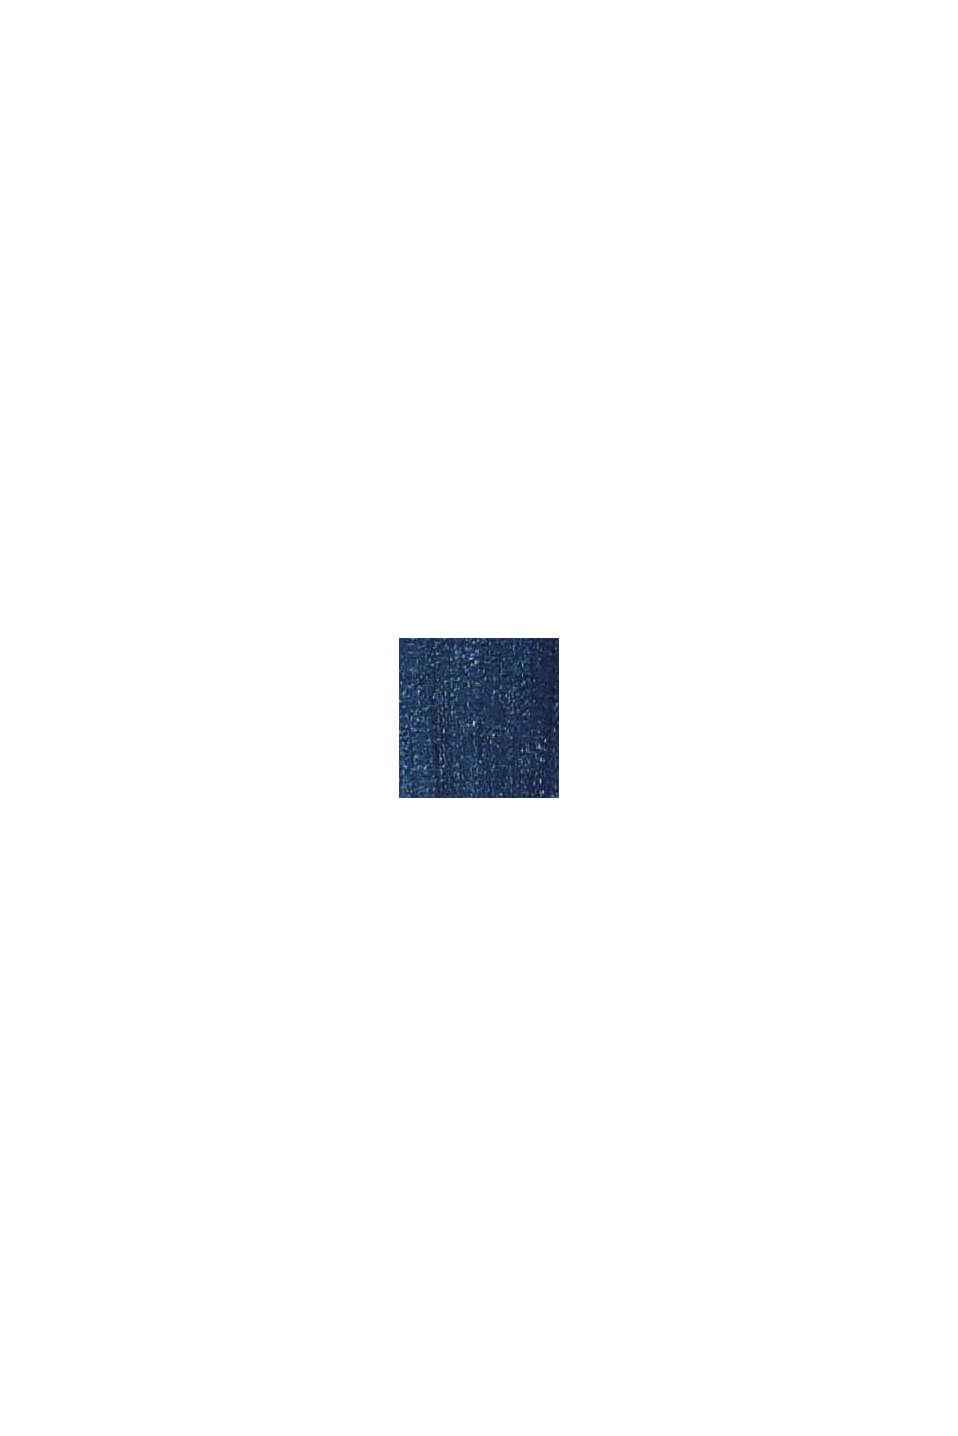 CURVY jeans met knoopsluiting en de touch van kasjmier, BLUE DARK WASHED, swatch